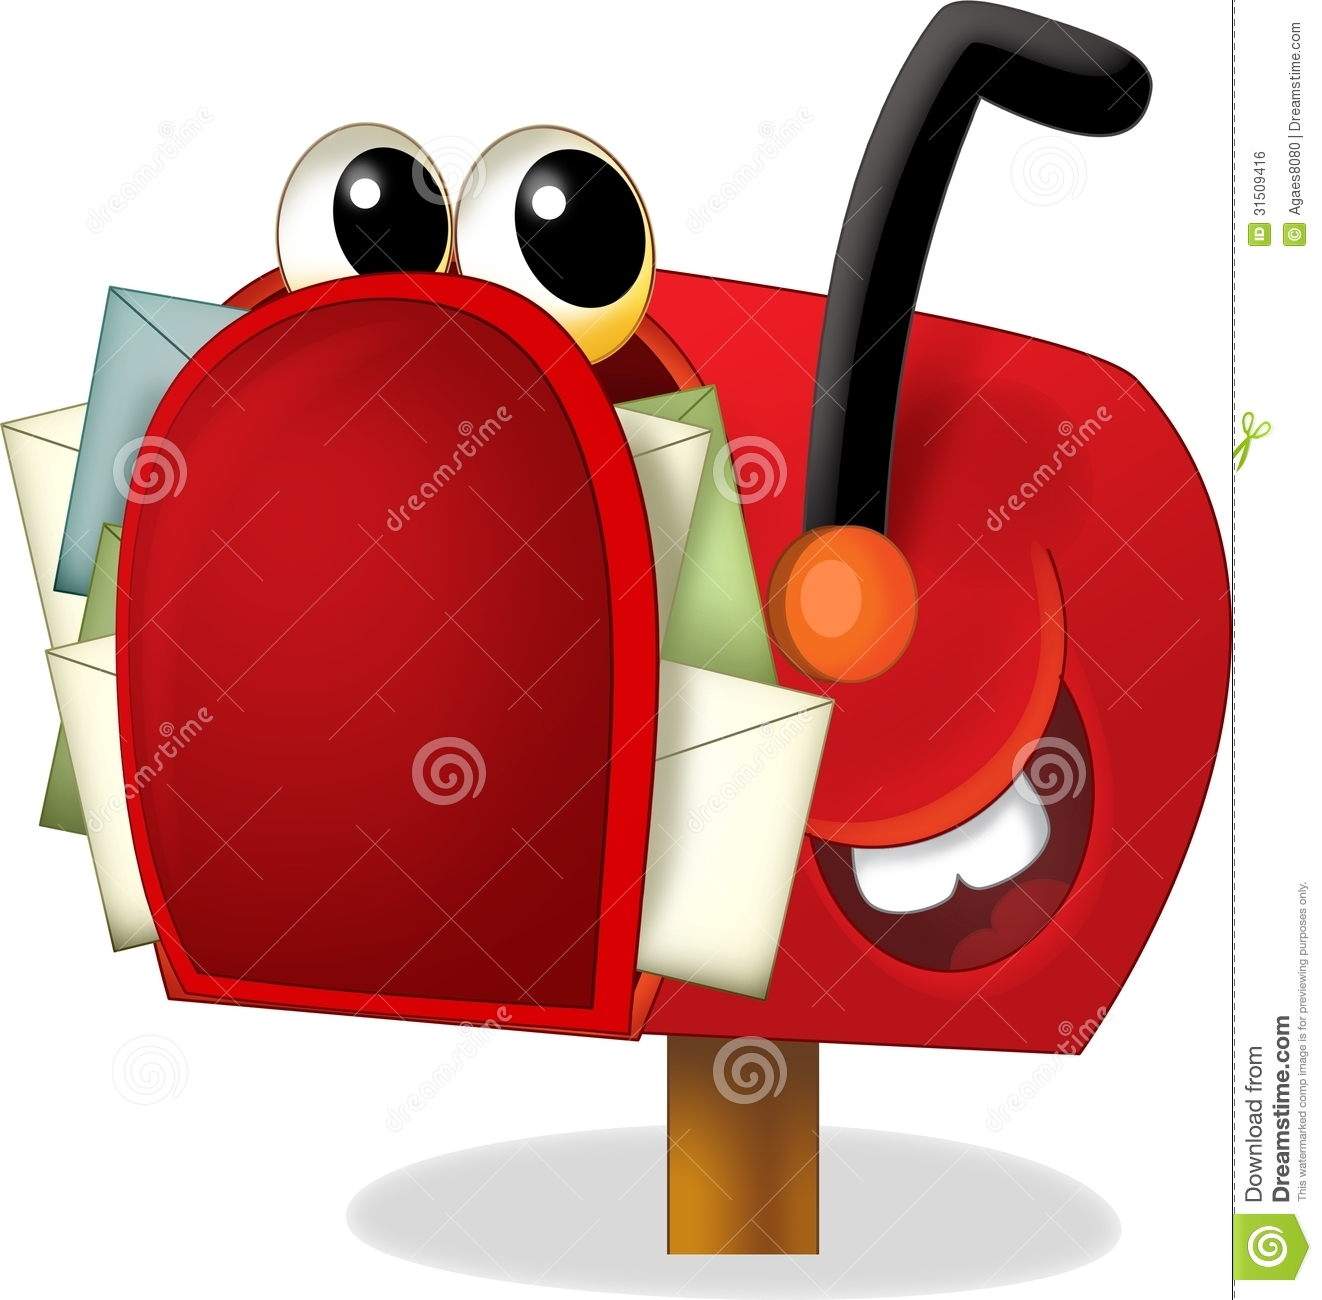 image gallery inbox clip art cartoons